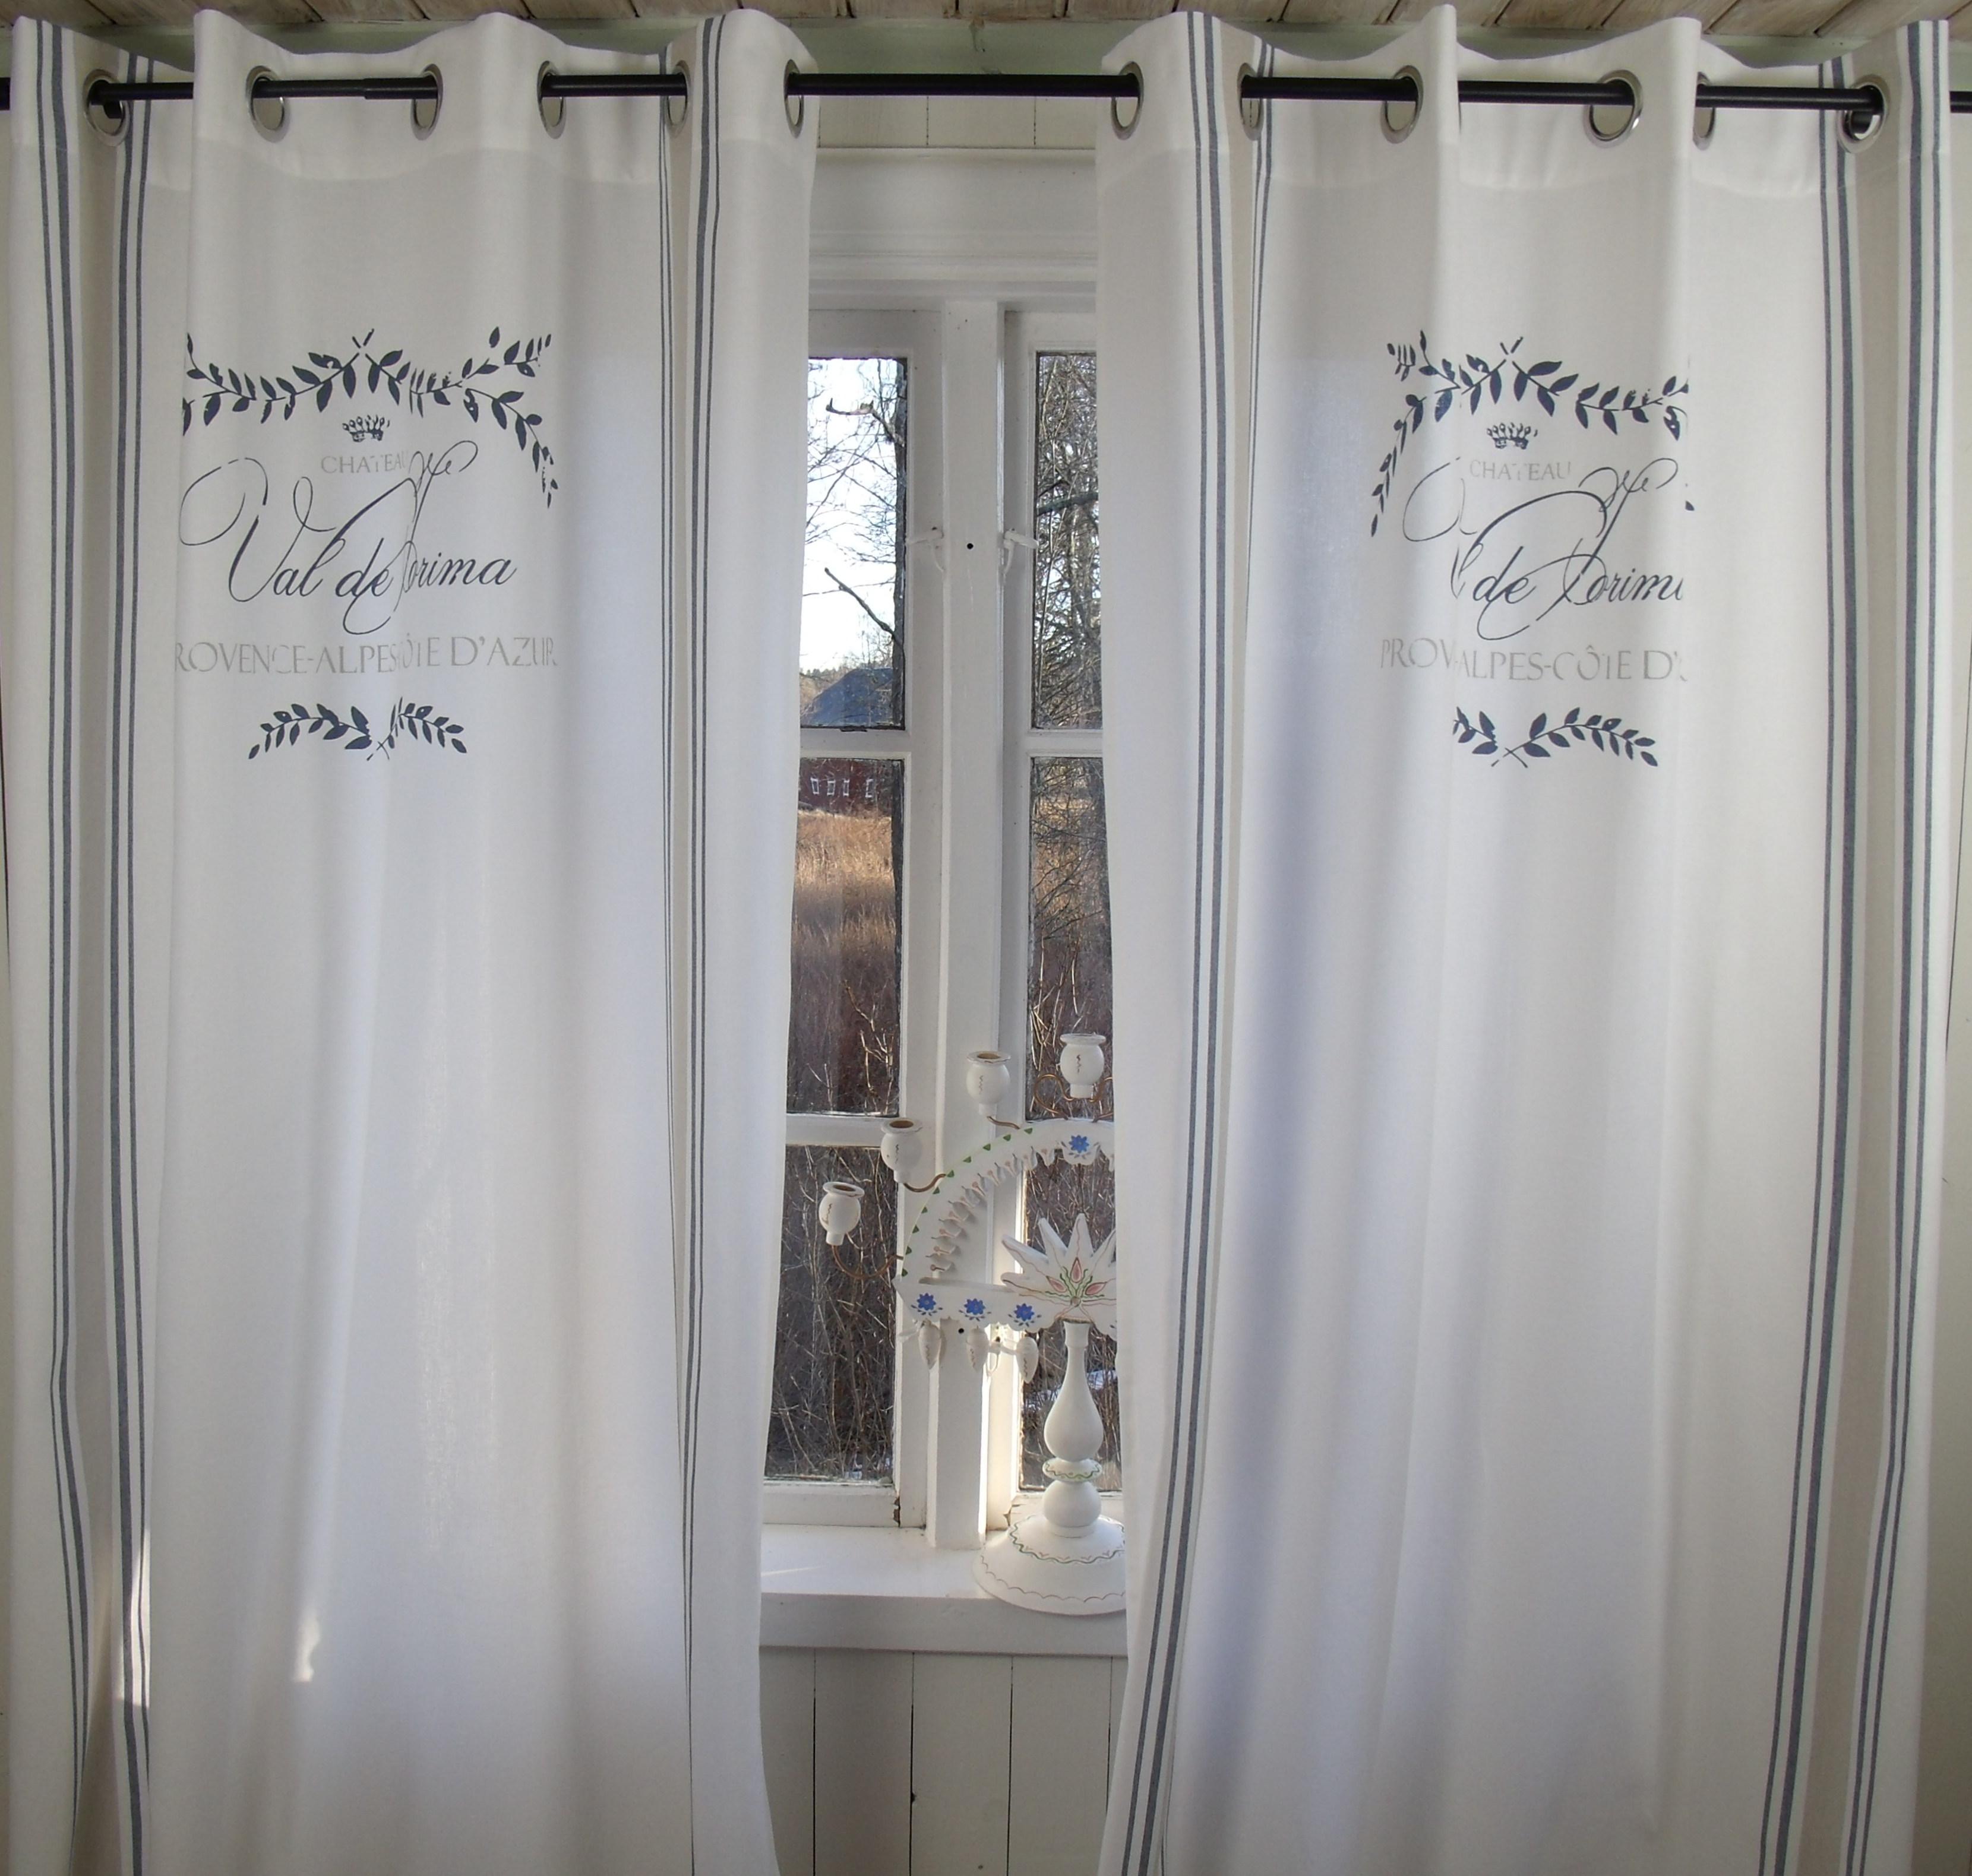 vorhang maje blau gardine 120x240 cm 2 st ck vorh nge spitzen gardinen gardinen. Black Bedroom Furniture Sets. Home Design Ideas